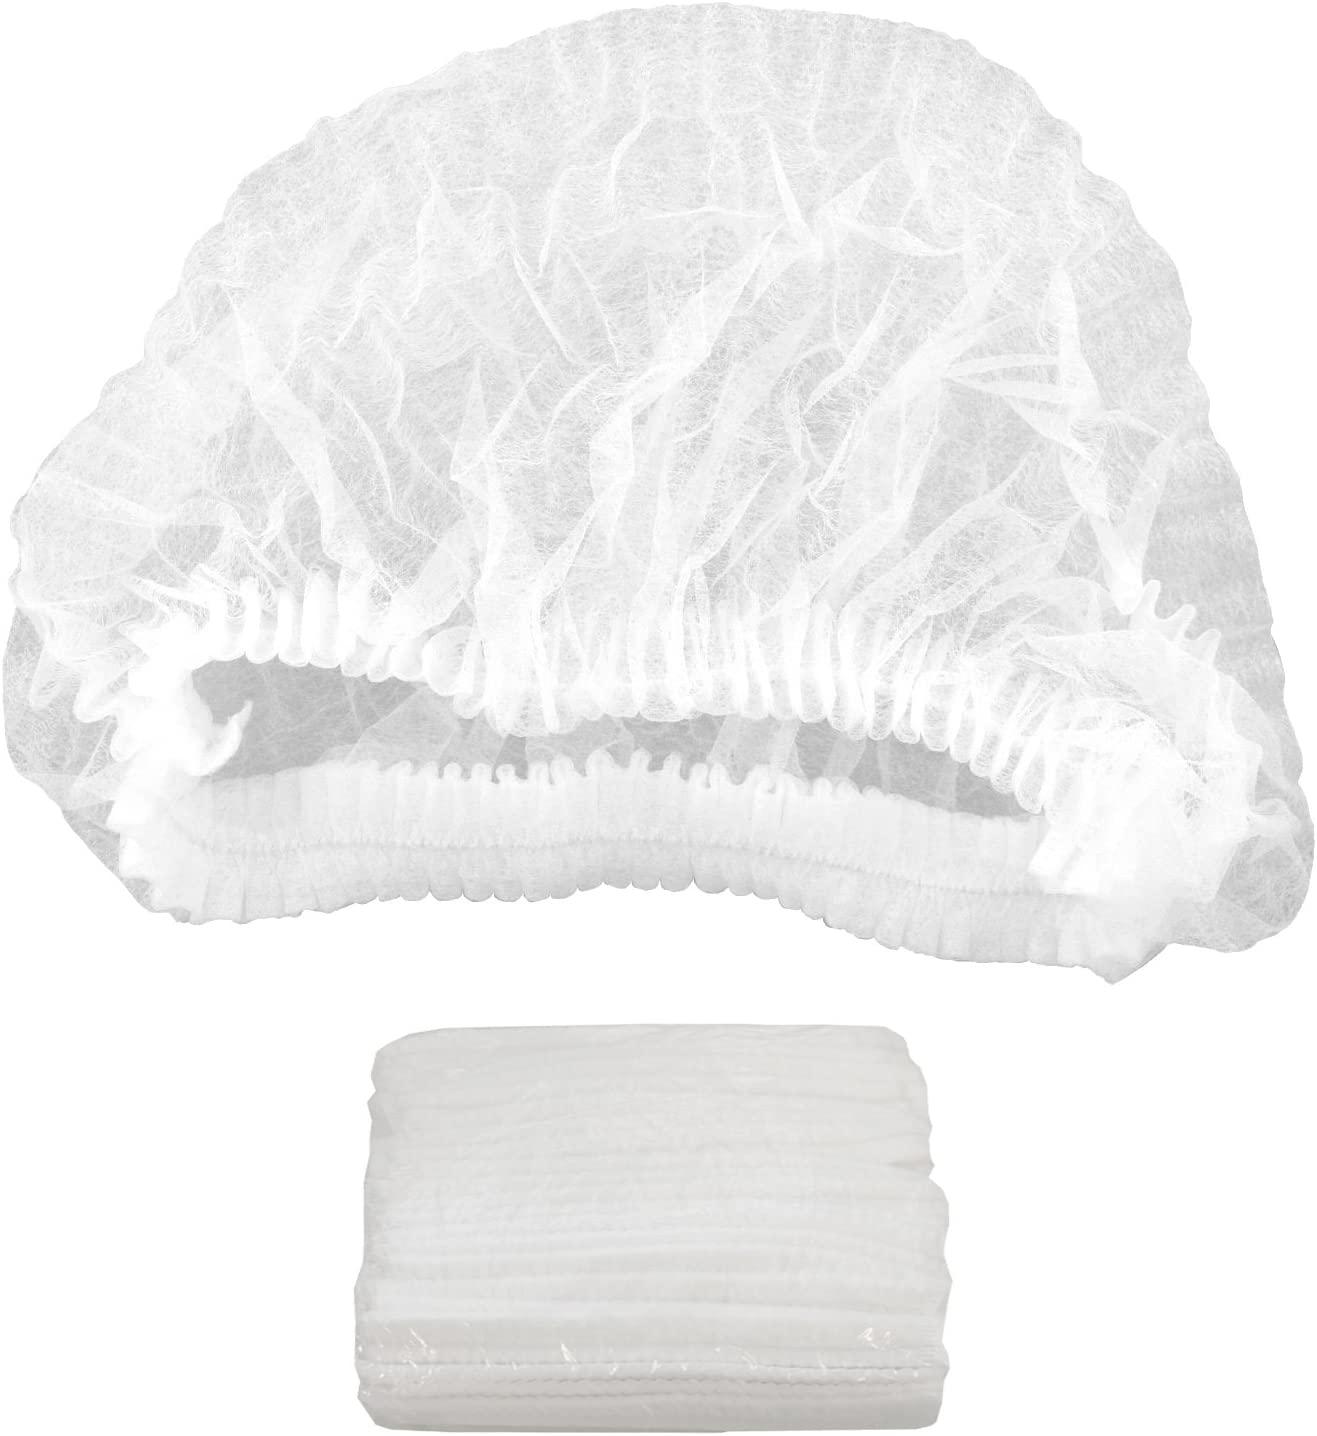 Belloccio TT-20H 100 Disposable Hair Net Caps: Sunless Spray Tanning, Salon, Spa, Food